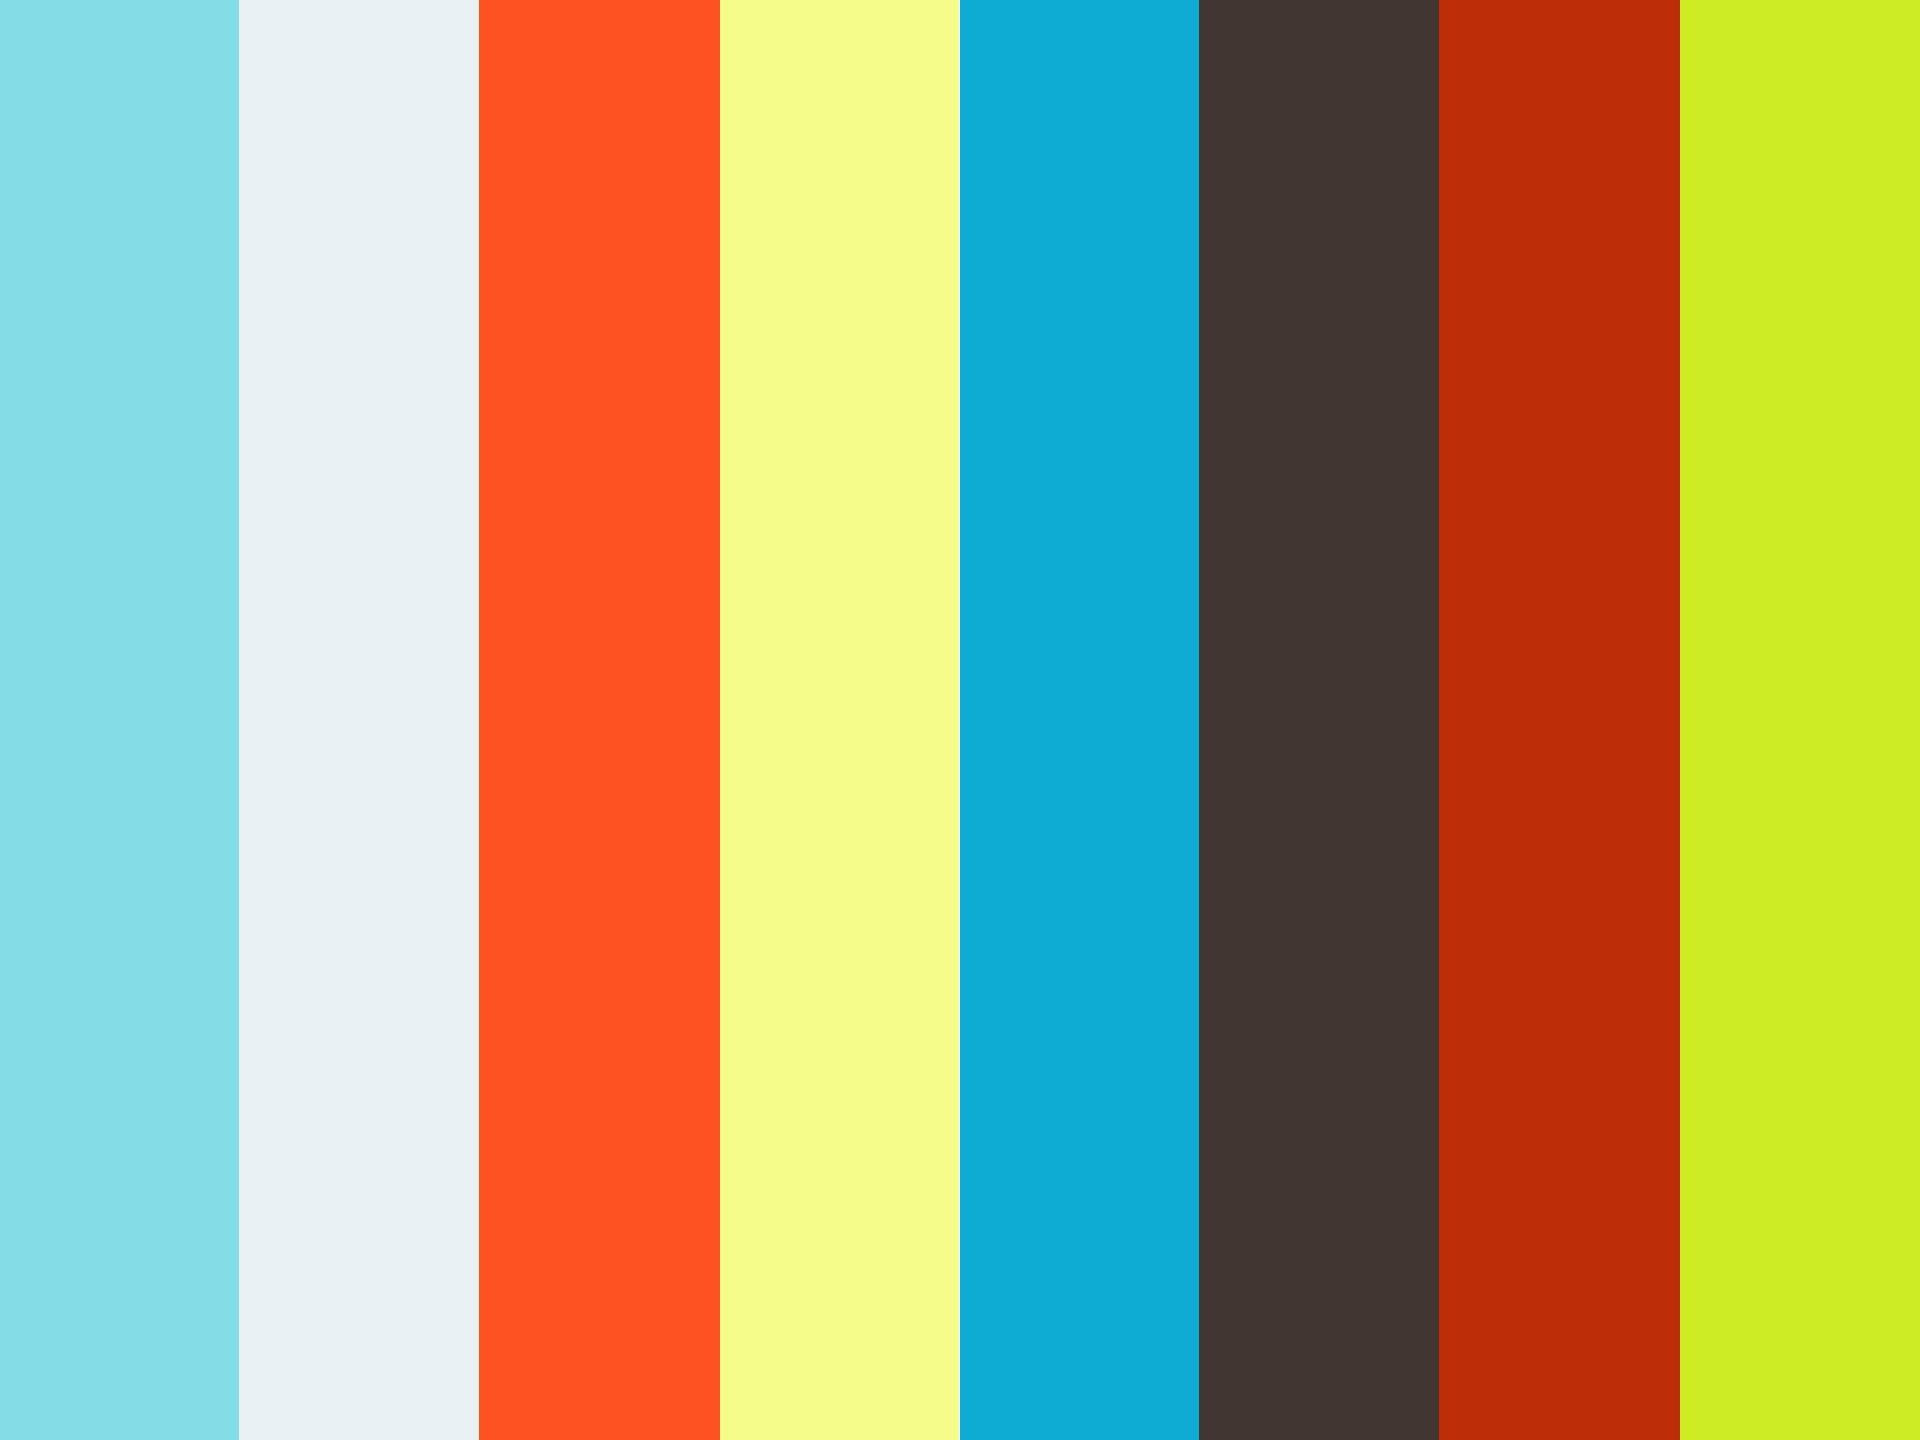 verizon 5g [ 1920 x 1080 Pixel ]